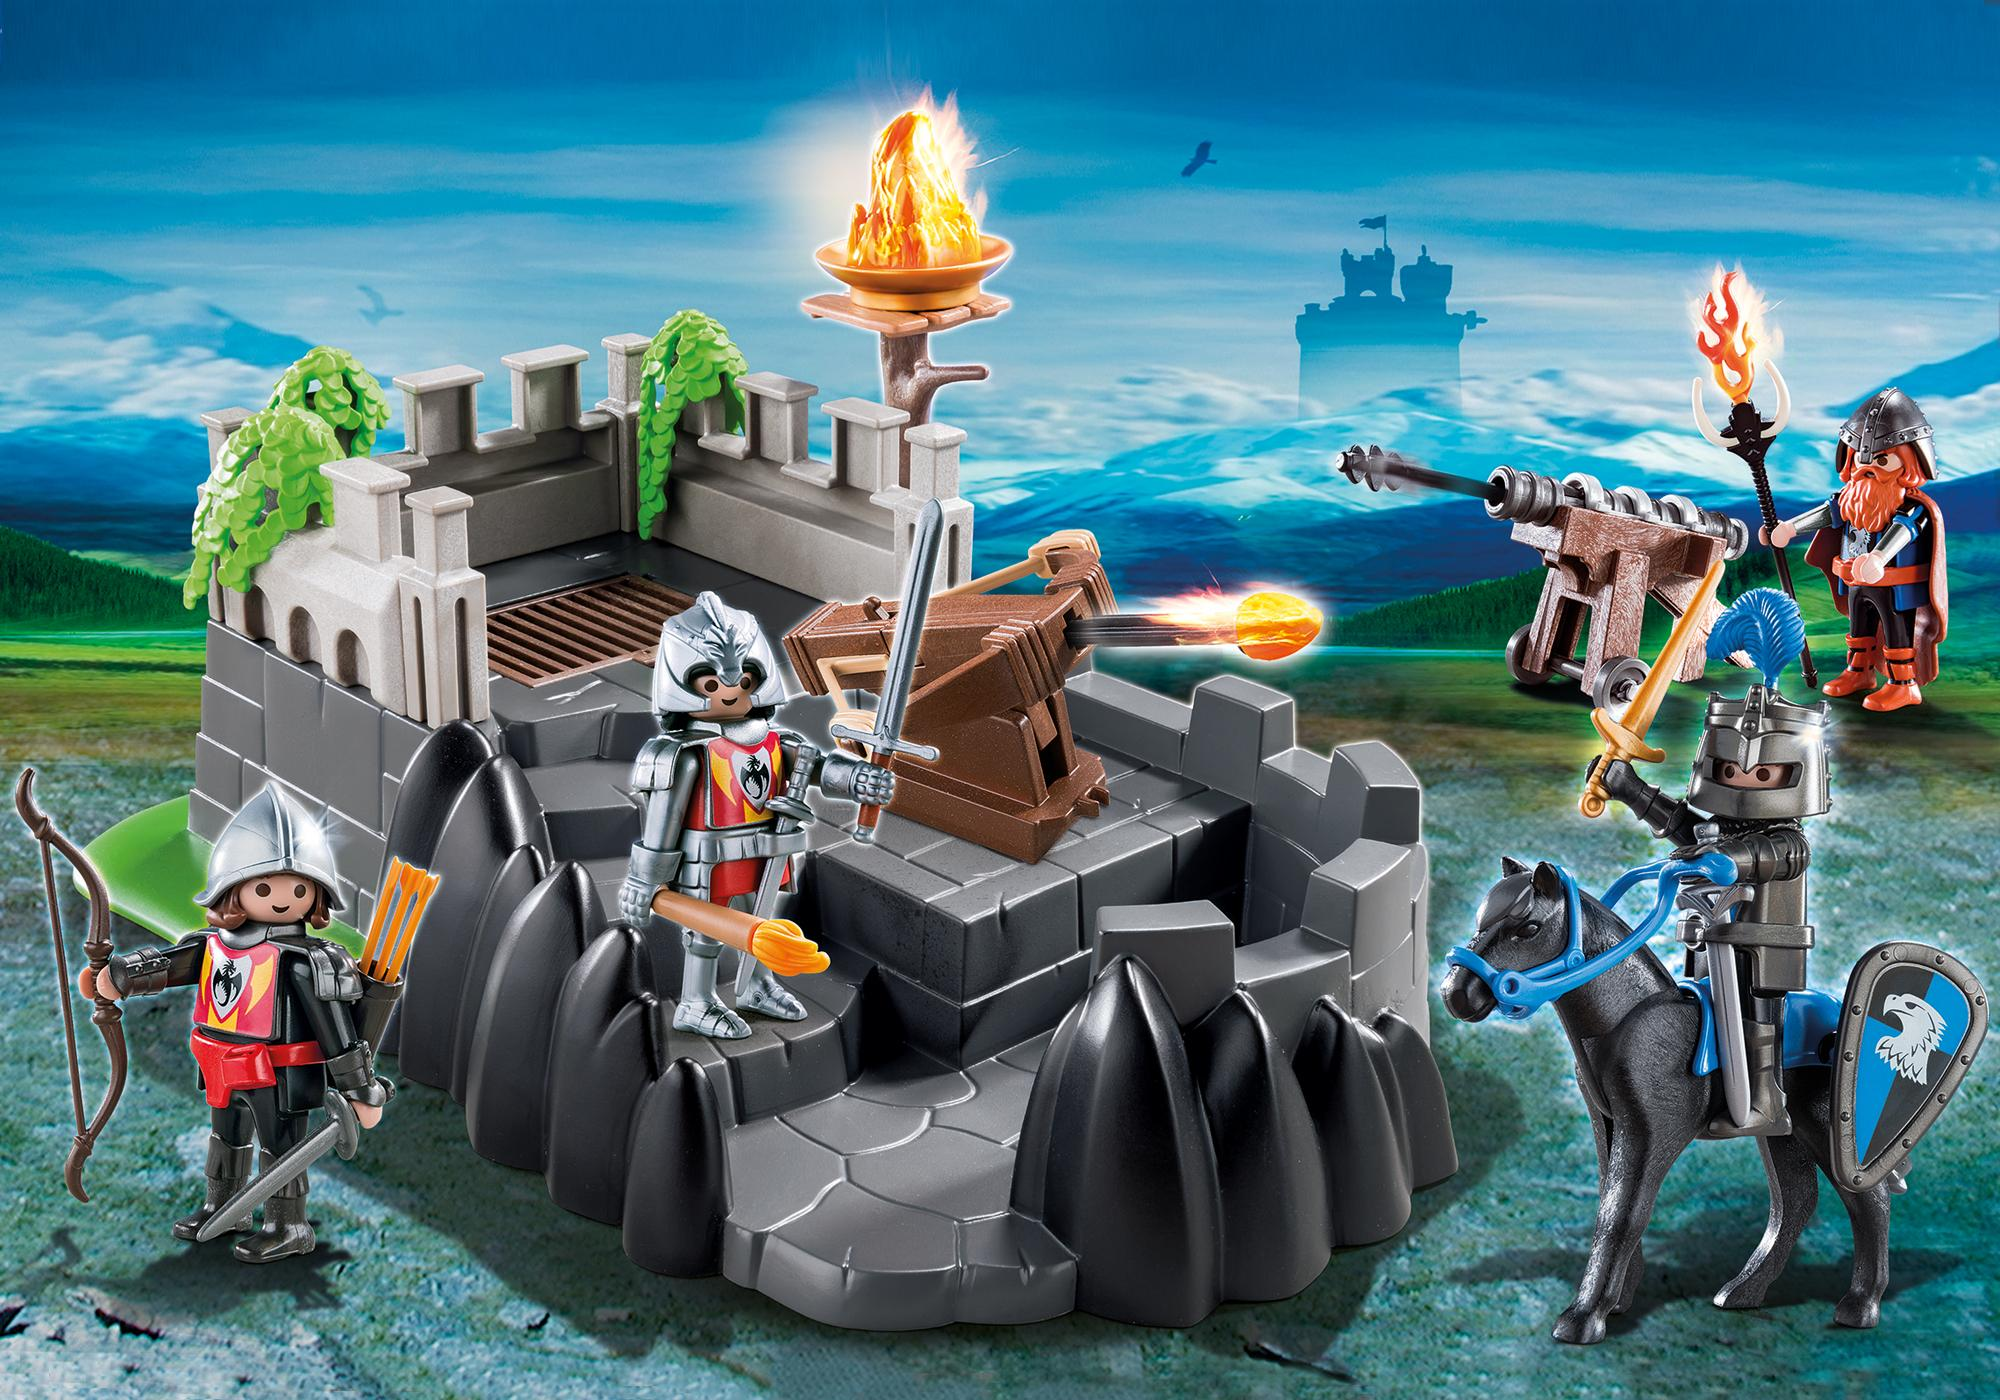 http://media.playmobil.com/i/playmobil/6627_product_detail/Bastion smoczych rycerzy